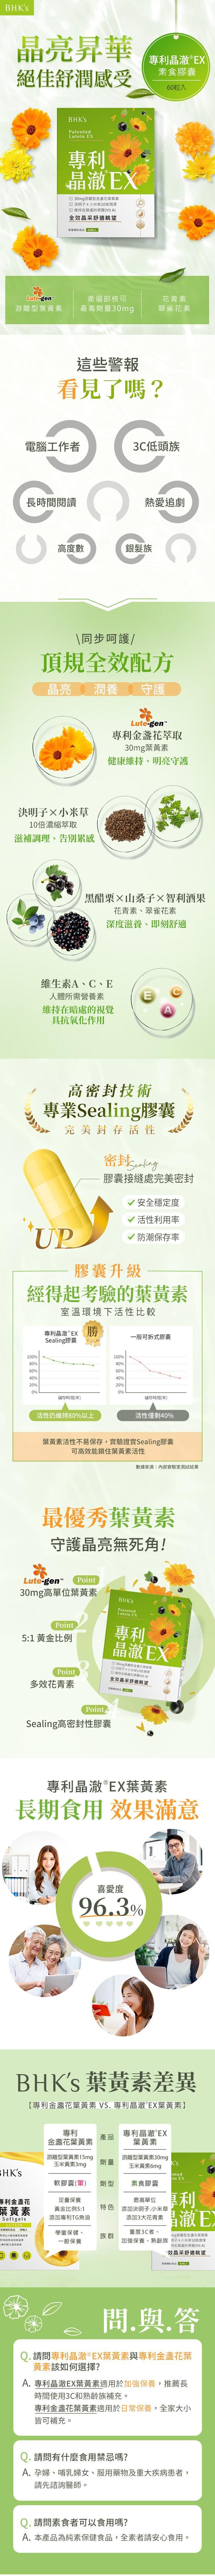 BHK's-專利晶澈葉黃素EX素食膠囊(60粒/盒)產品資訊